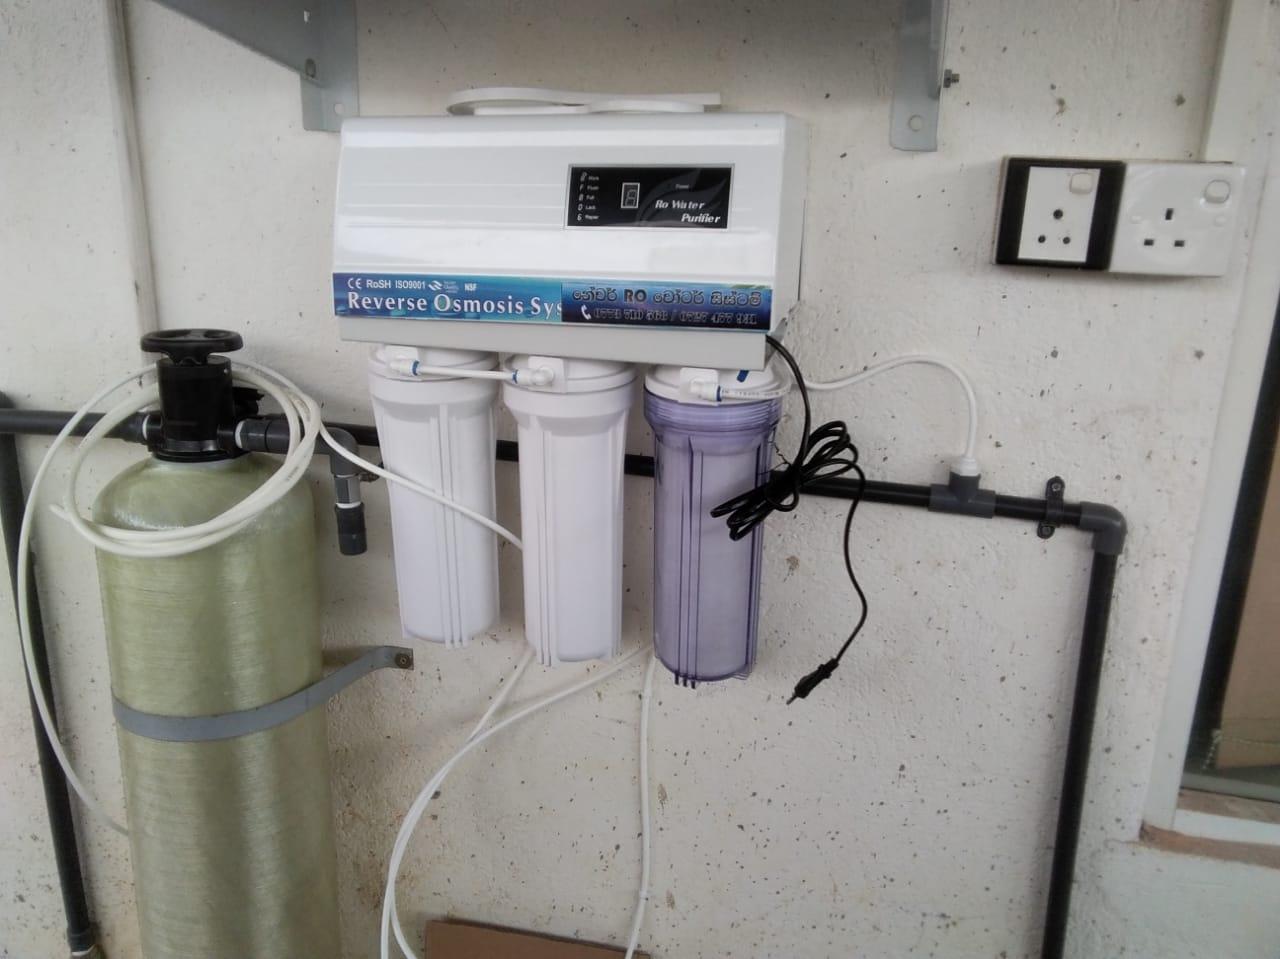 Best Quality Ro Water Filter Sri Lanka 2020